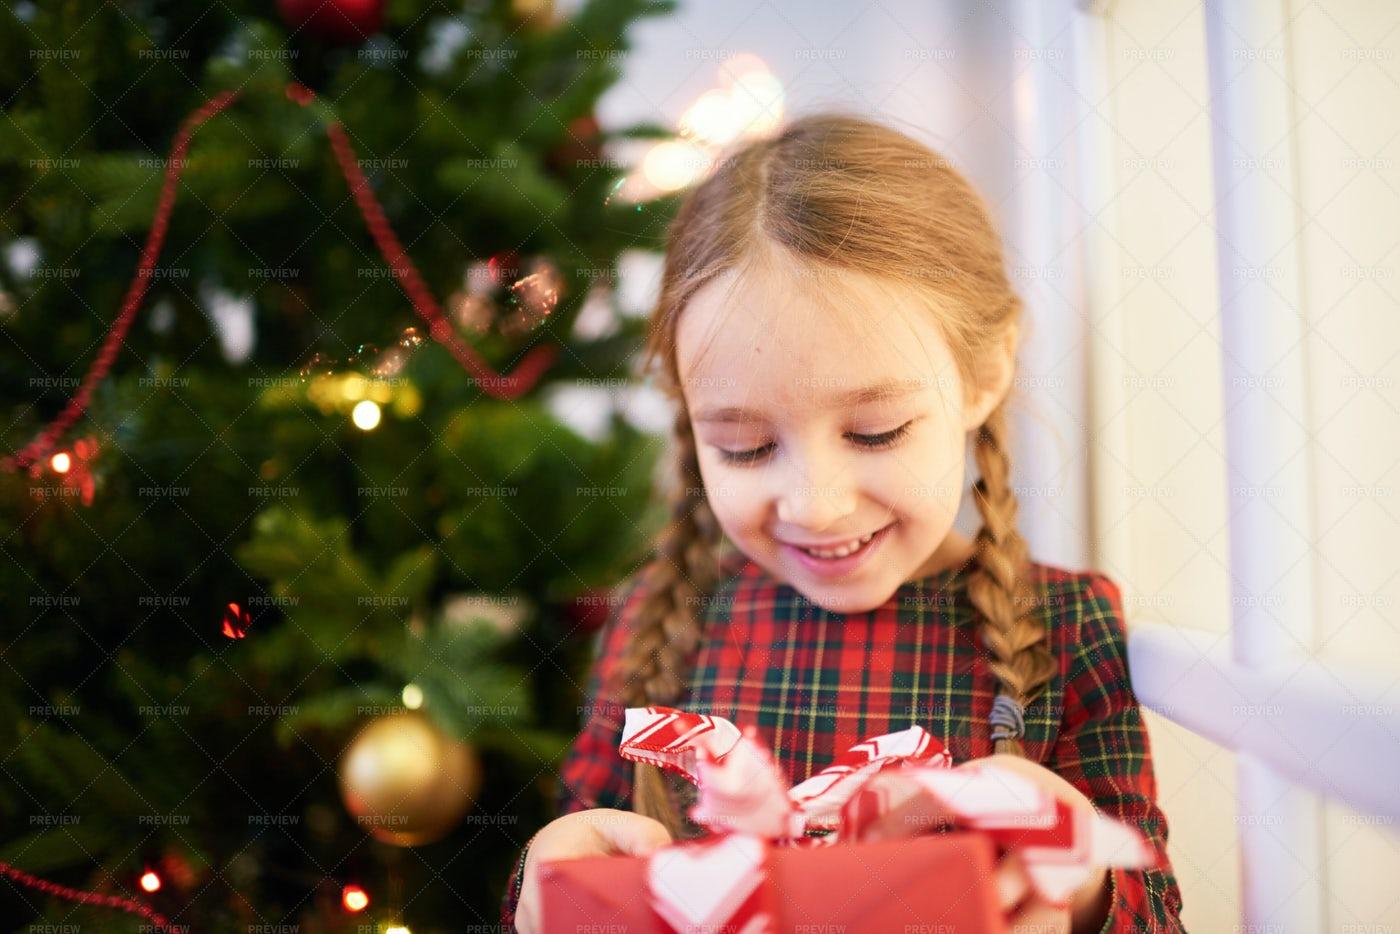 Opening Christmas Gift: Stock Photos